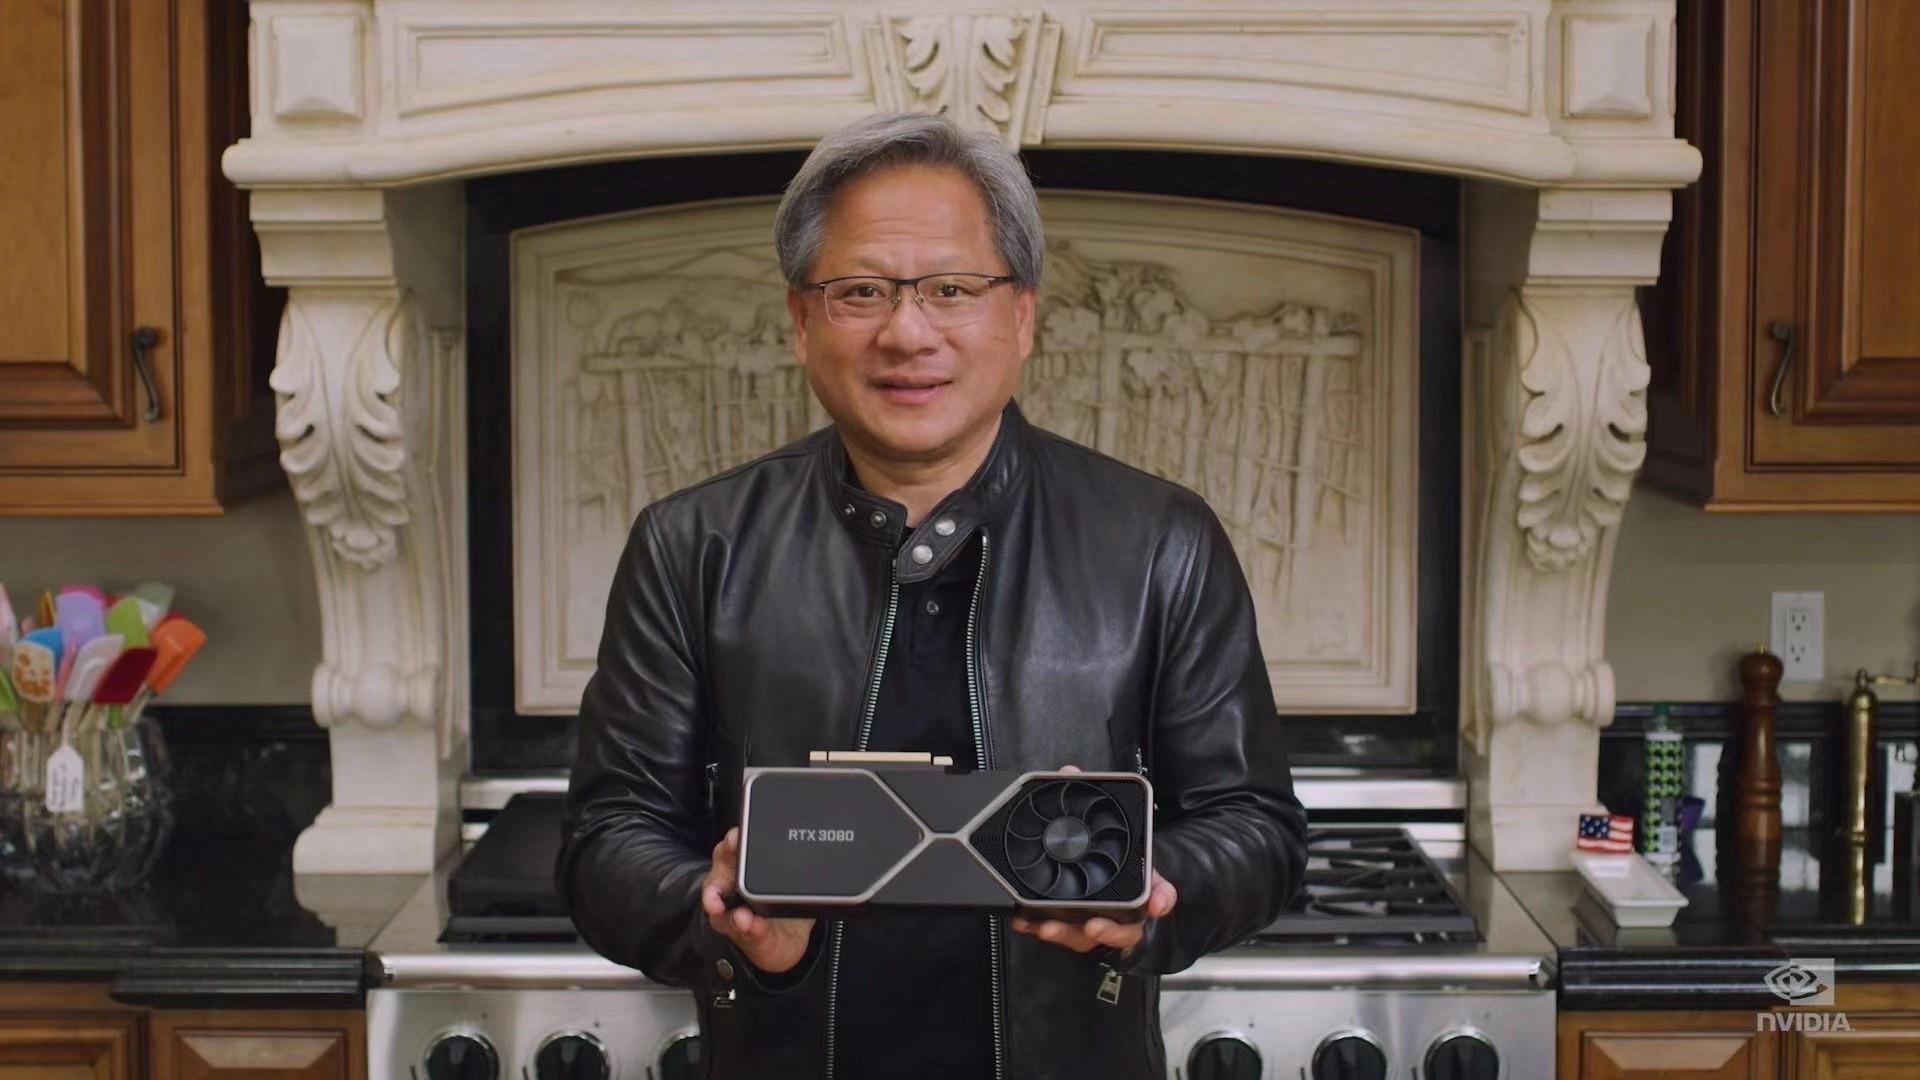 NVIDIA发布RTX 30系列显卡,RTX 3090售价11999元